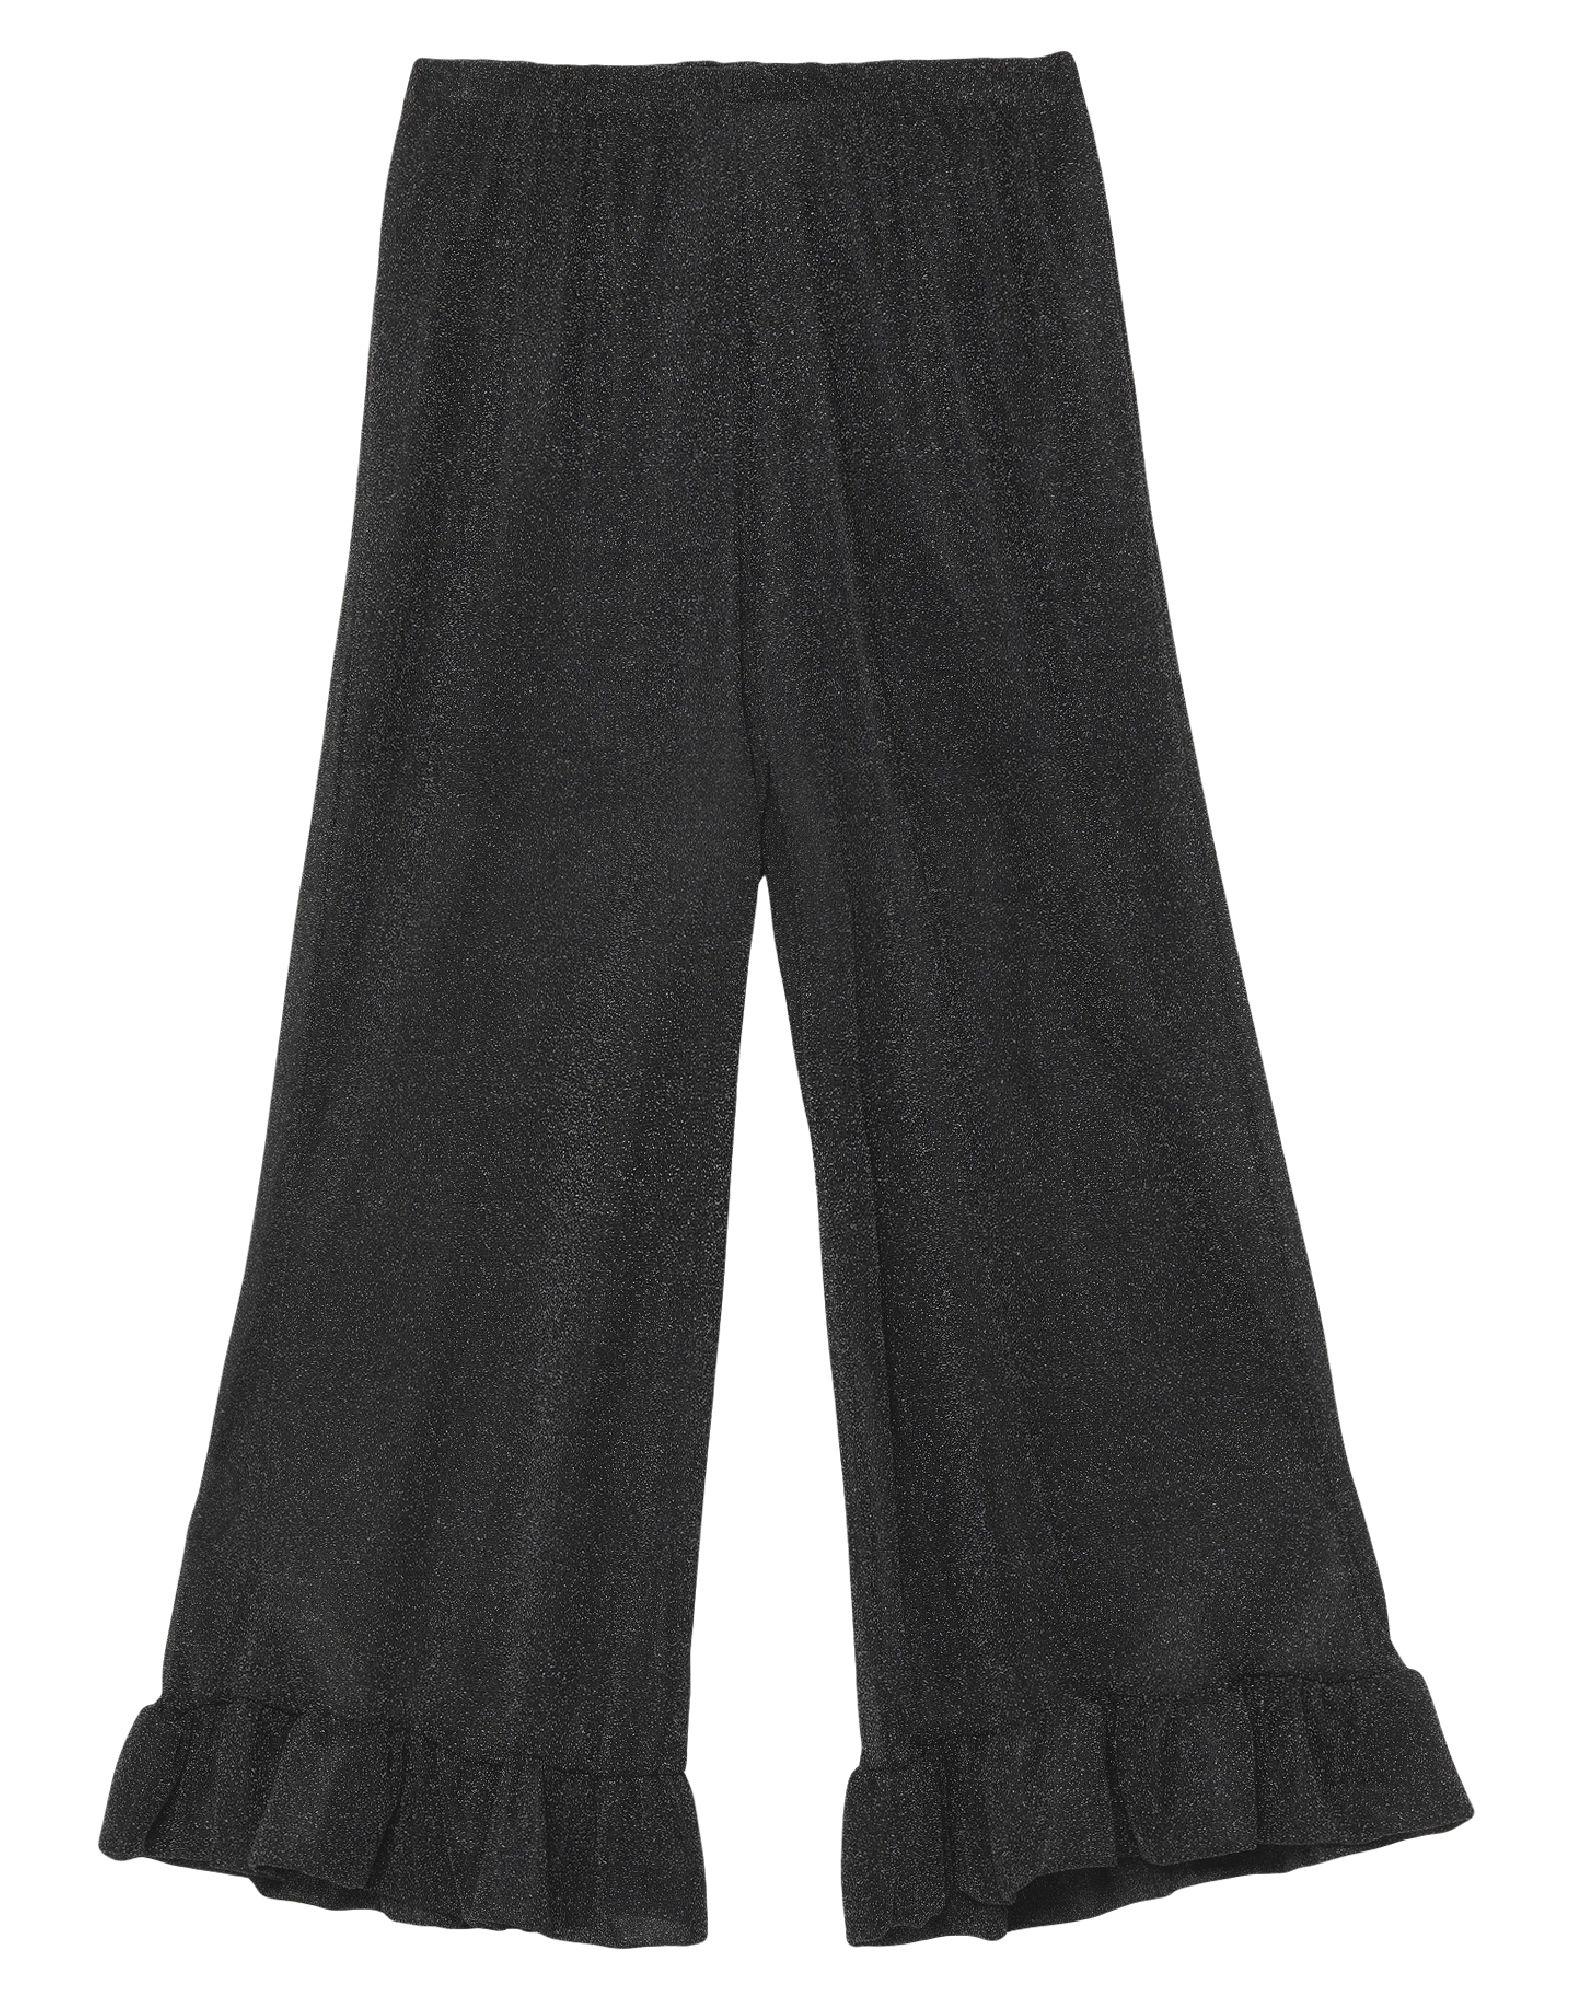 LUCE Casual pants. jersey, lamé, solid color, ruffles, high waisted, regular fit, flare & wide-leg, elasticized waist, no pockets. 70% Polyamide, 30% Metallic fiber